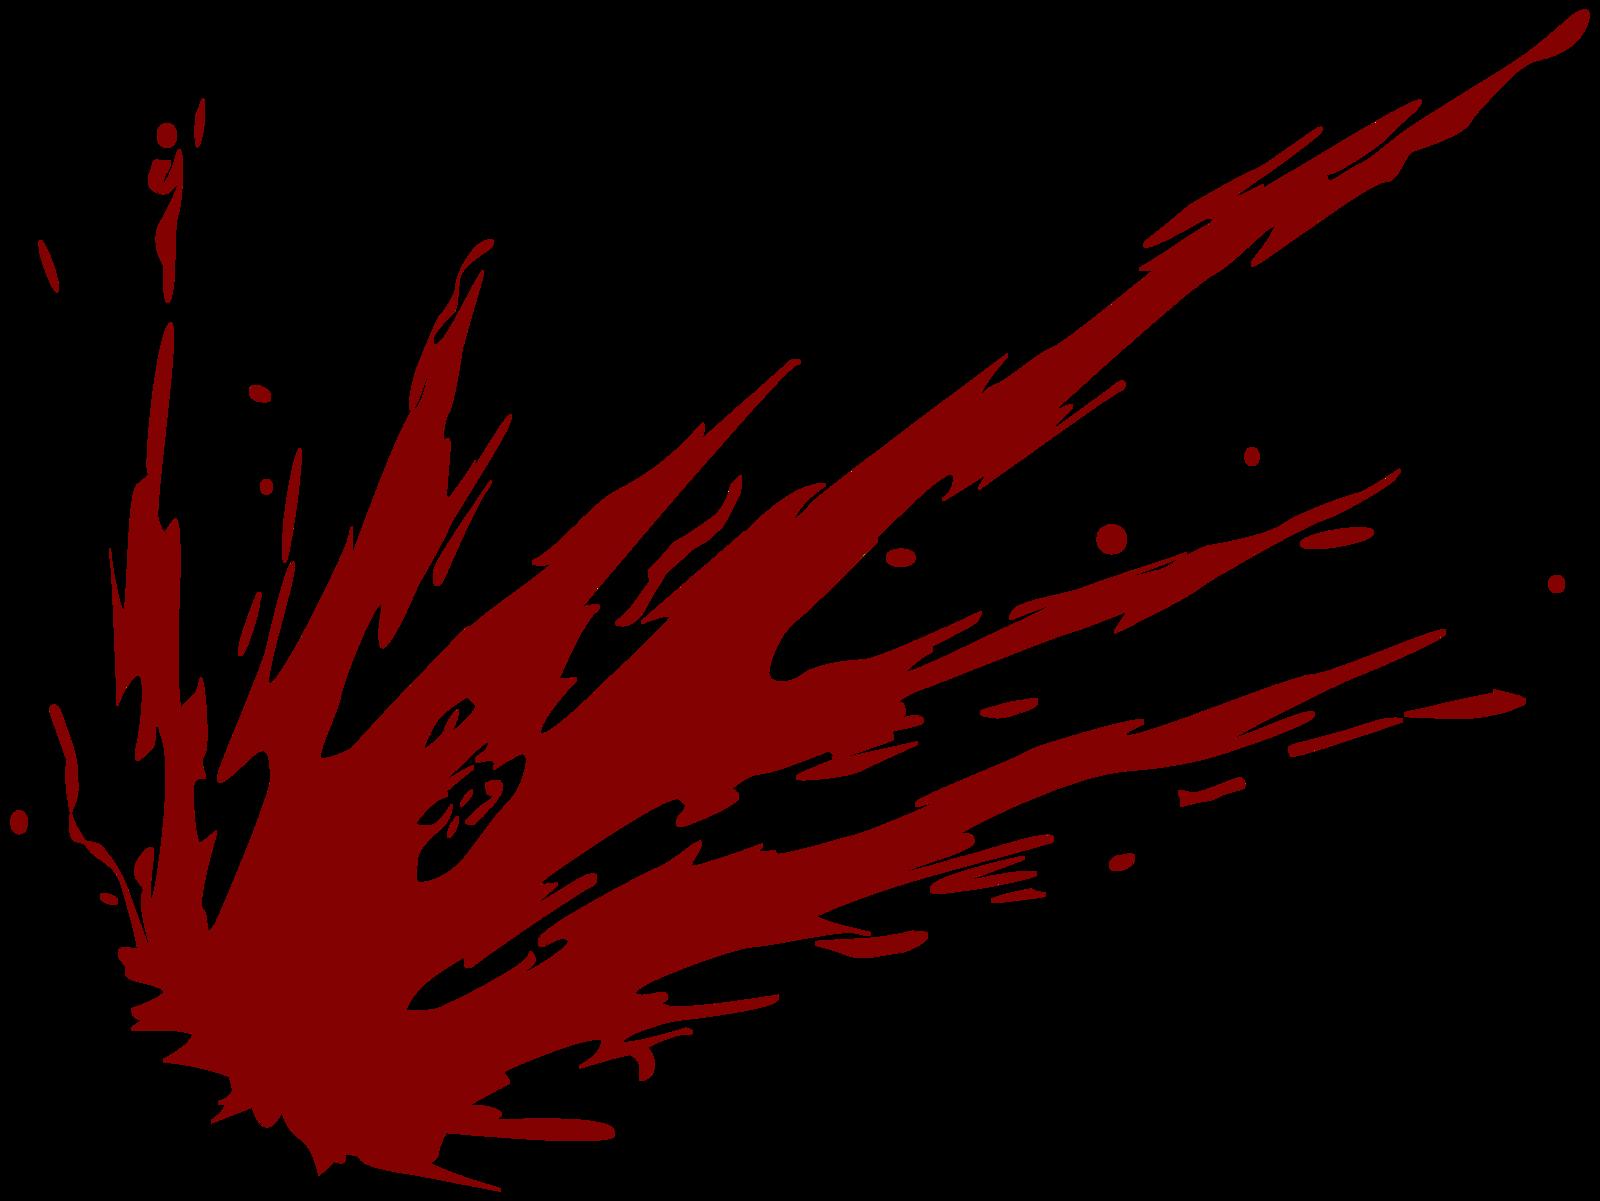 blood splatter clipart photo 14063 transparentpng rh transparentpng com  blood splatter clip art with gray background